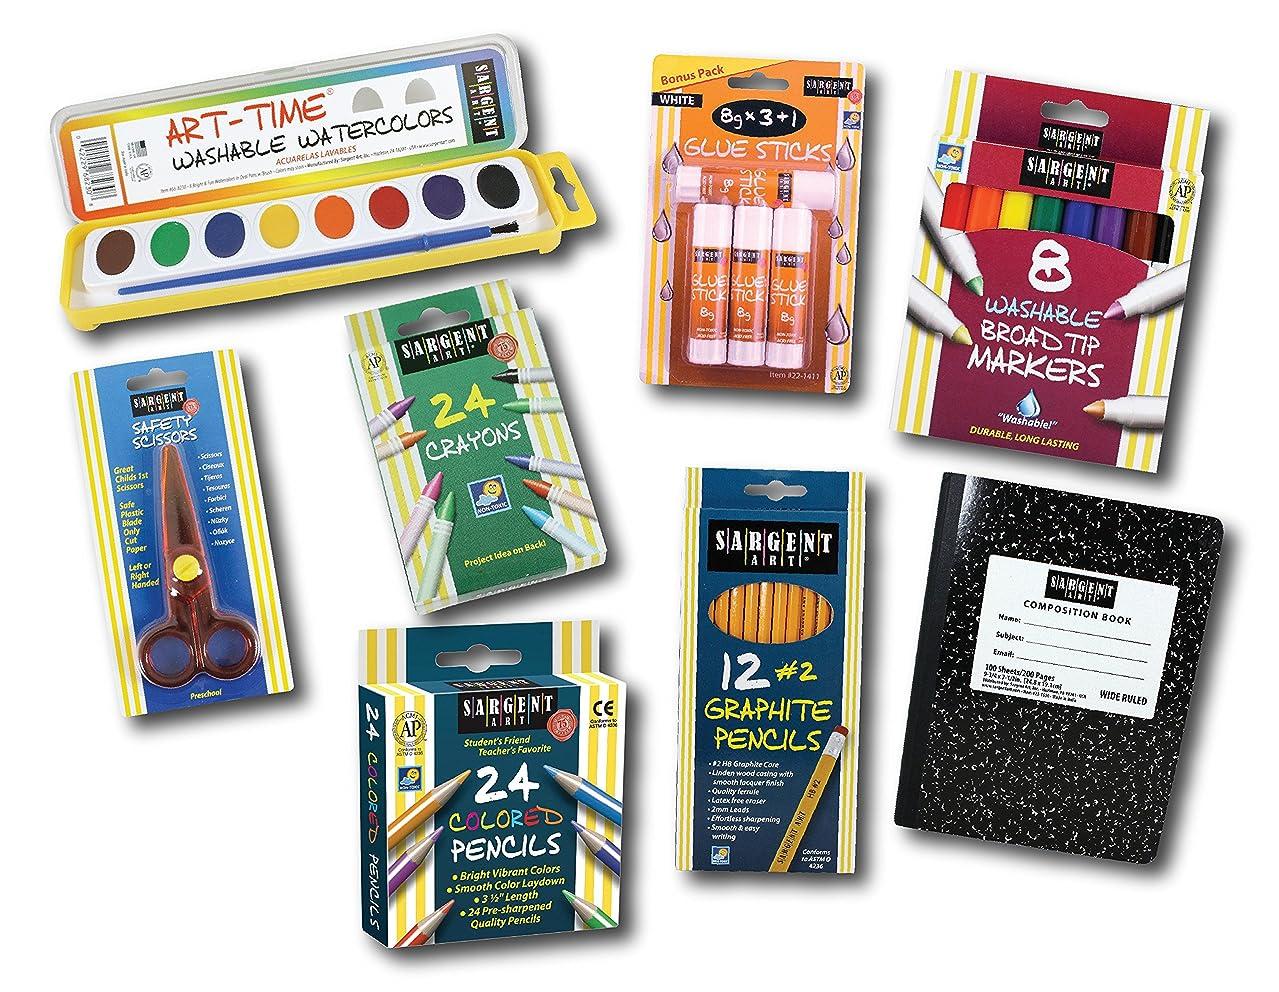 Sargent Art 22-0050 Back to School Essentials Kit 8pc Art Activity Set, Colored, Watercolor Paints, Crayons, Markers, Glue Sticks, Graphite Pencils, Composition Book, Safety Scissors